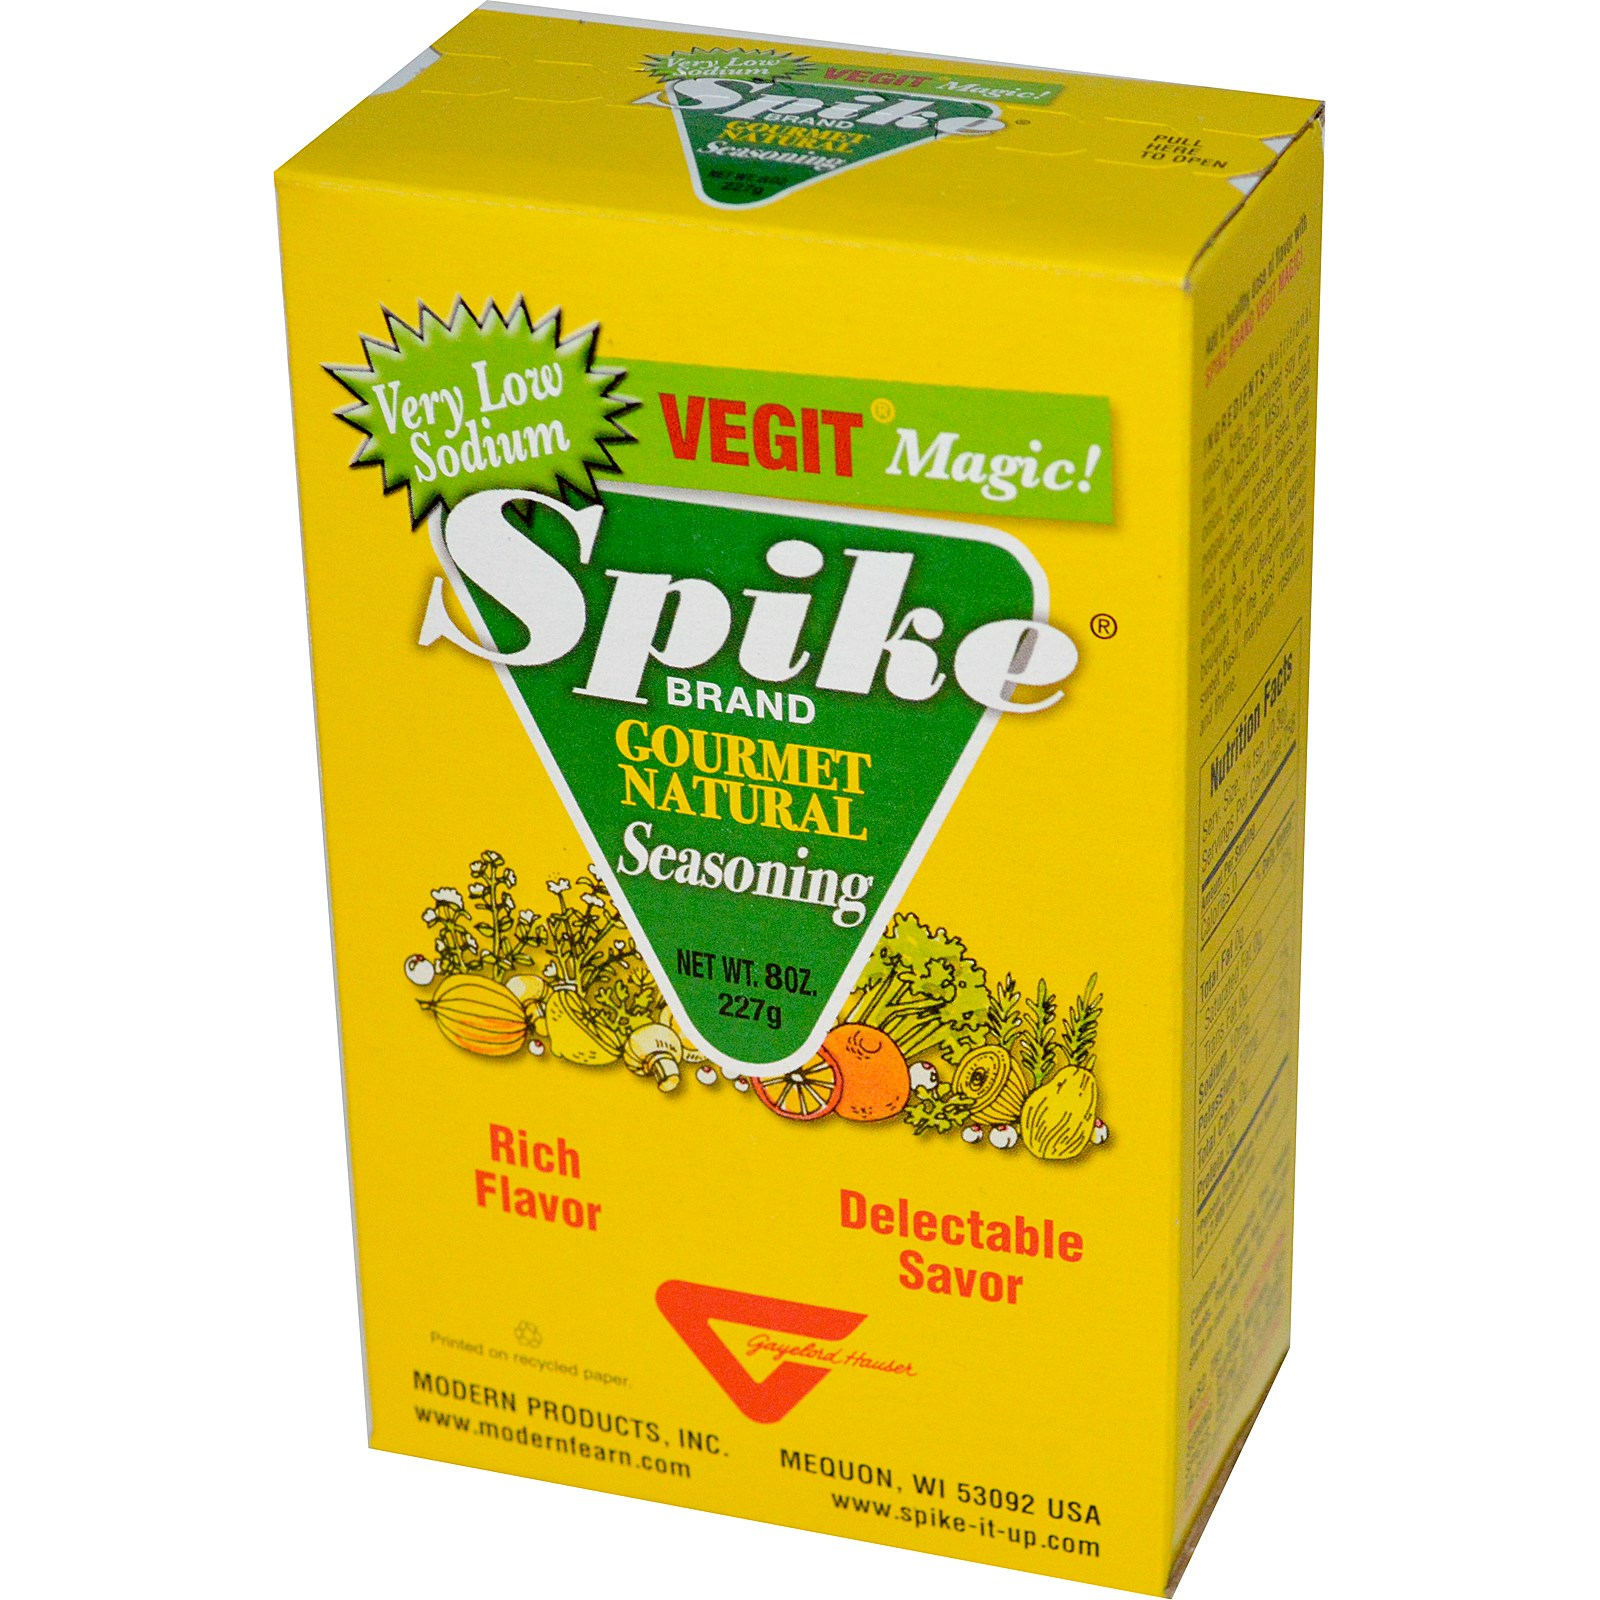 Modern Products, Spike Brand Vegit Magic!, Изысканная Натуральная Приправа 8 унции (227 г)